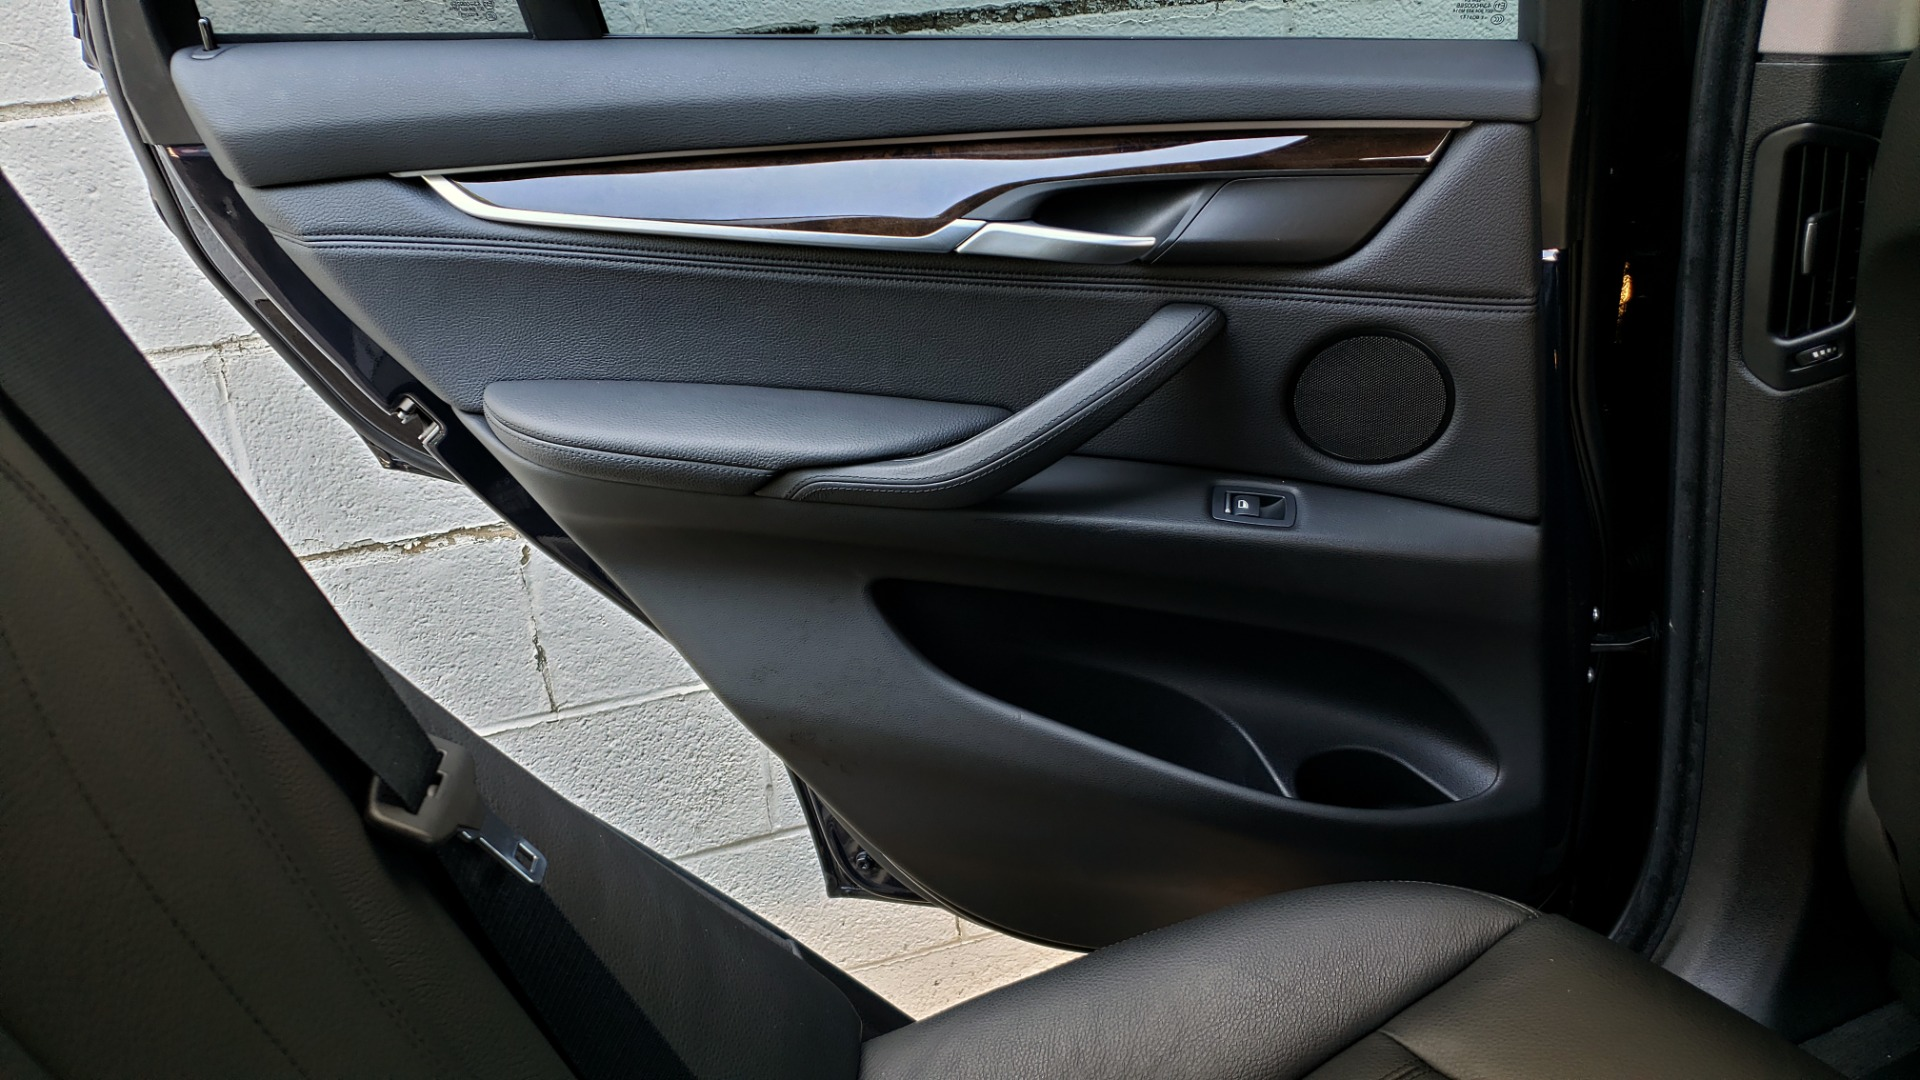 Used 2016 BMW X5 XDRIVE35I / PREM PKG / NAV / DRVR ASST PLUS / REARVIEW for sale $25,765 at Formula Imports in Charlotte NC 28227 41